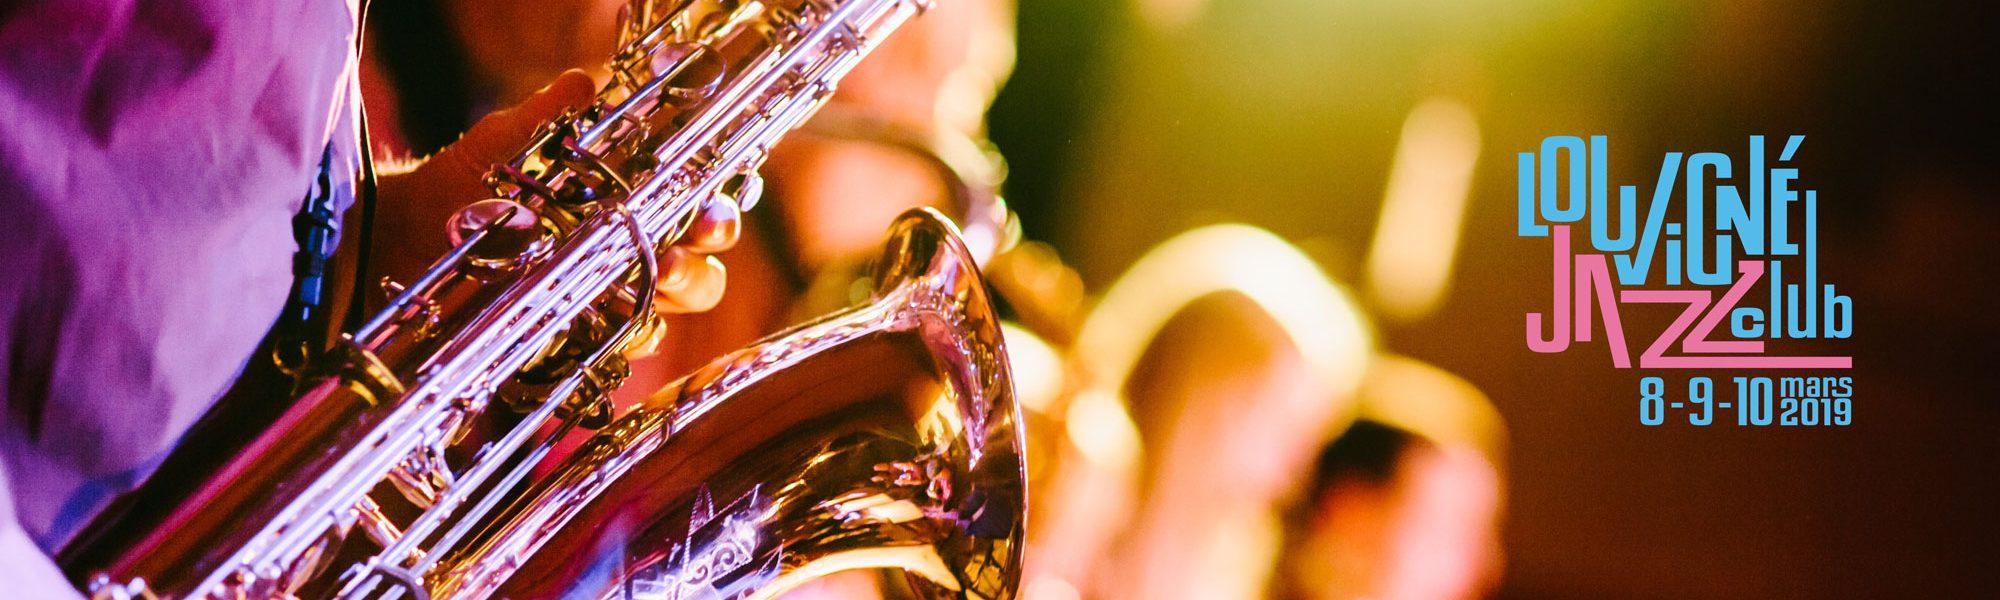 Jazz en ille-et-vilaine